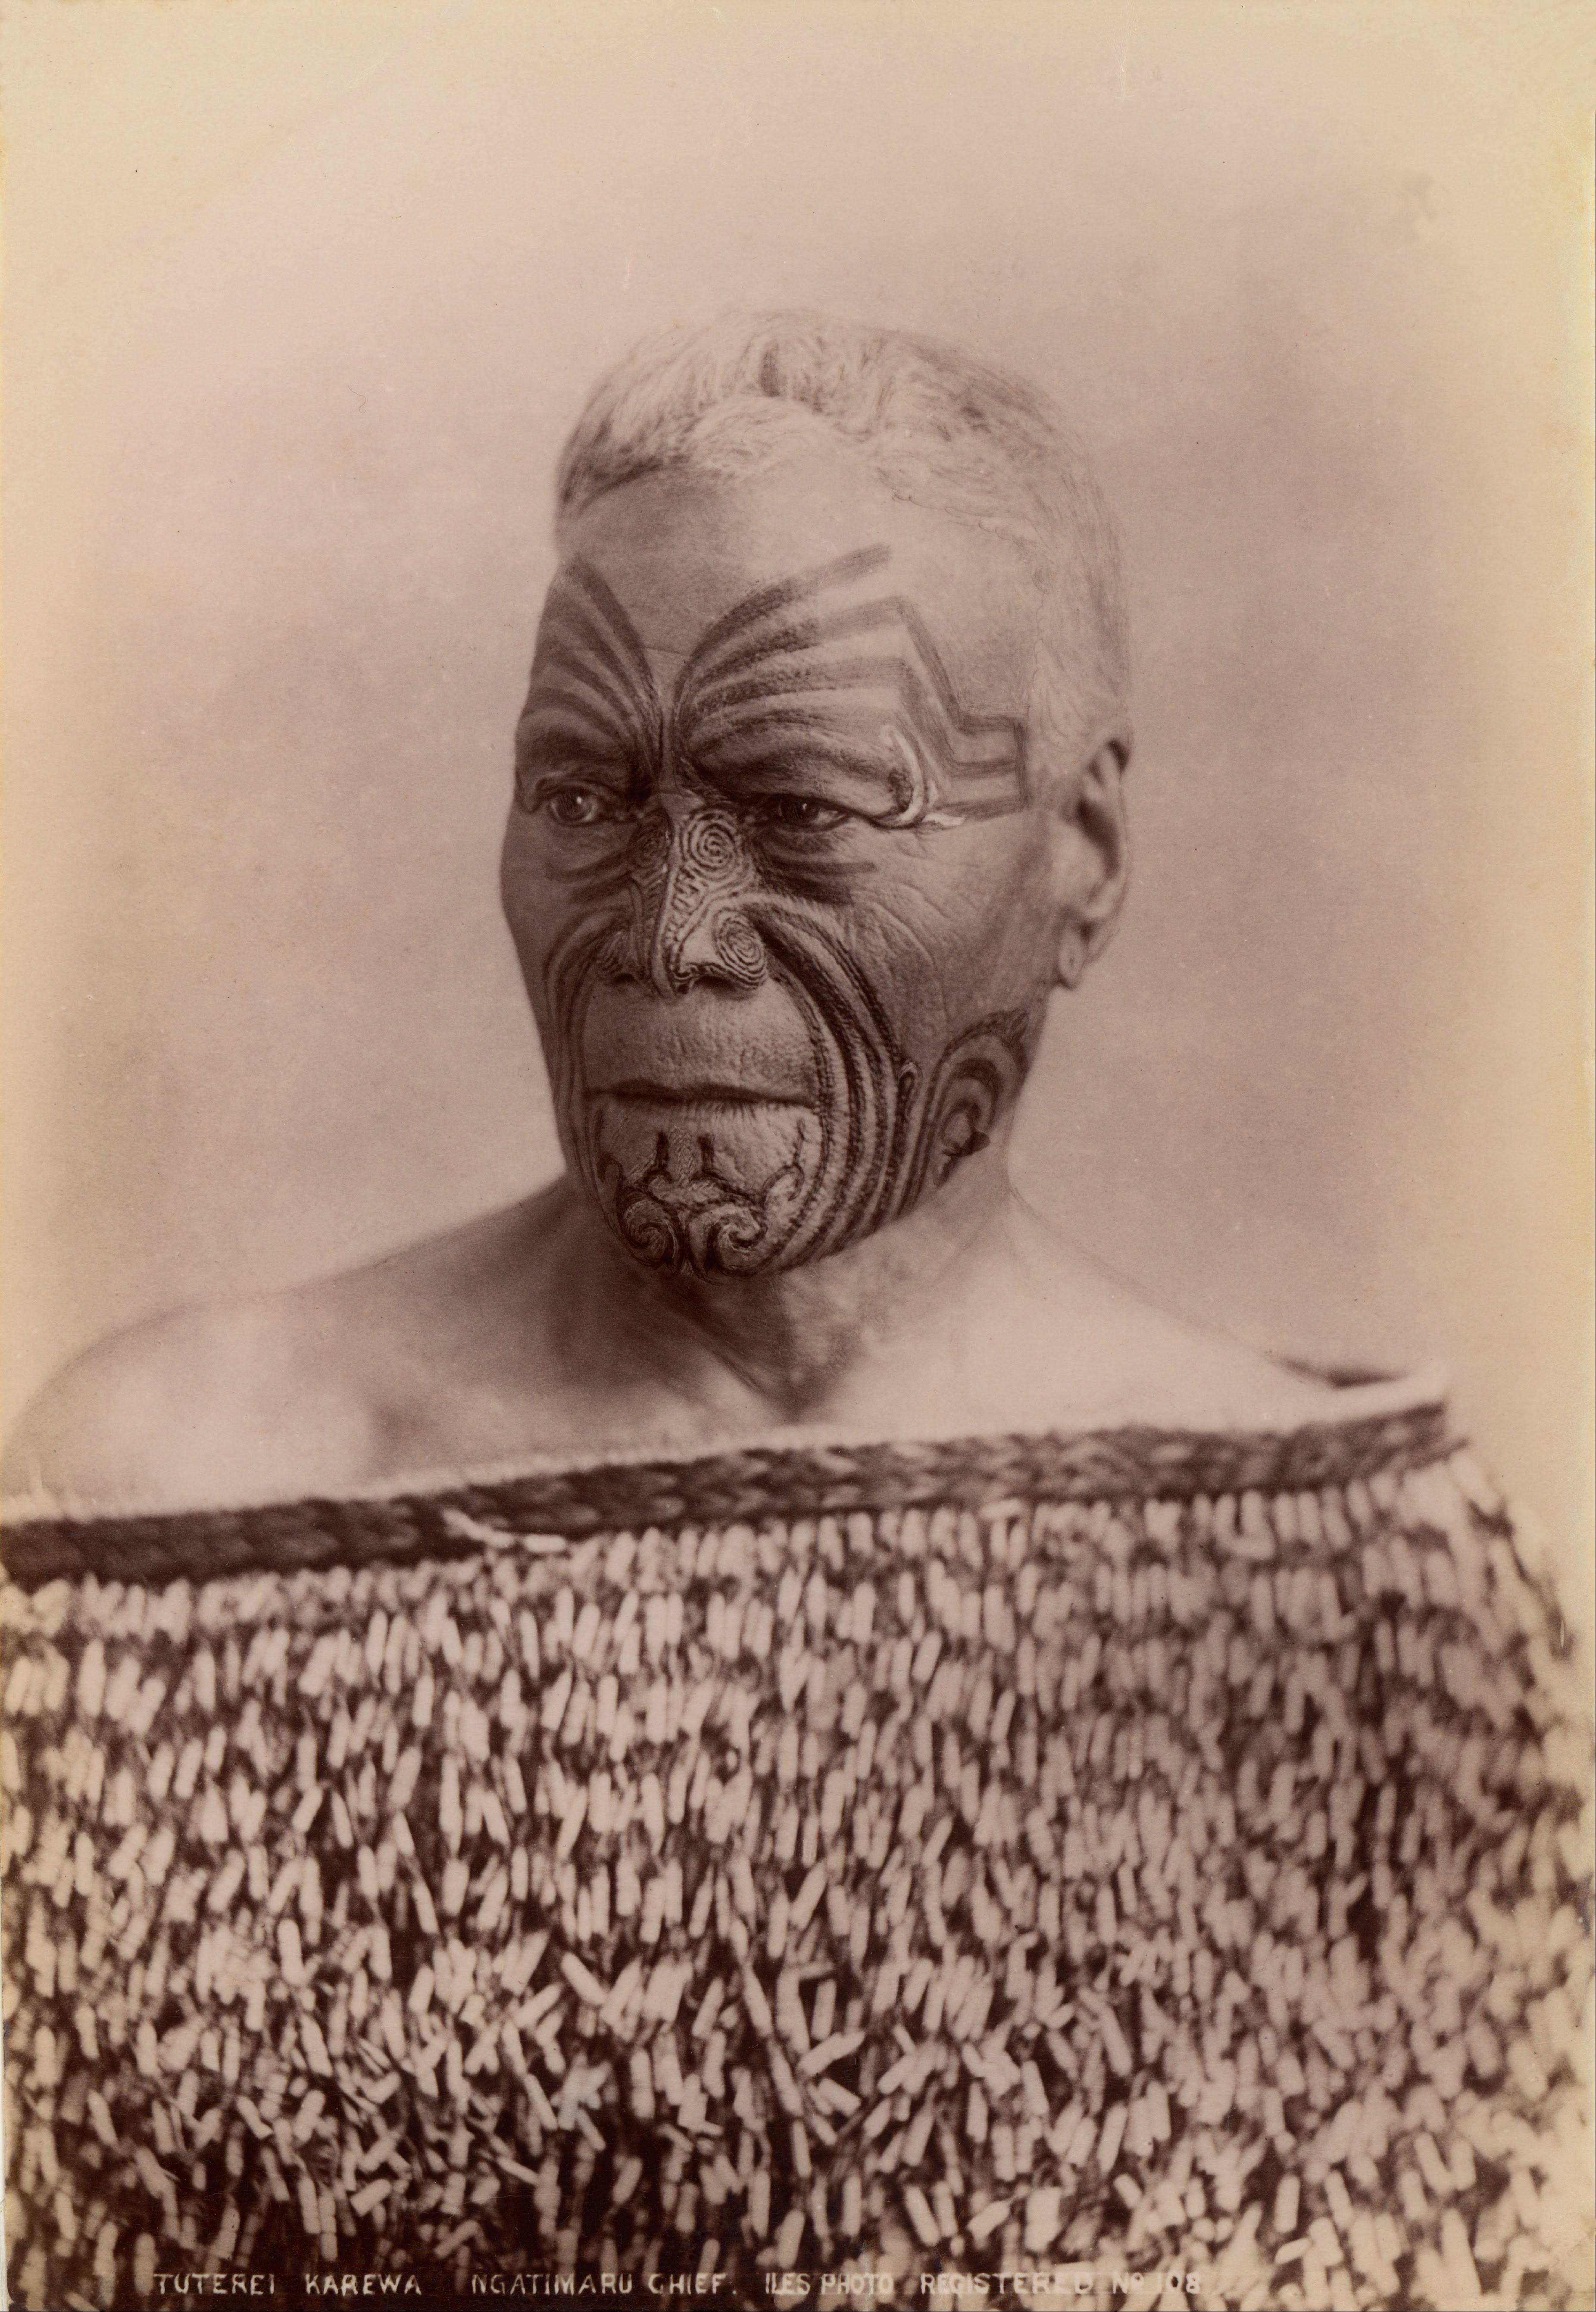 Tuterei Karewa Of The Ngatimaru